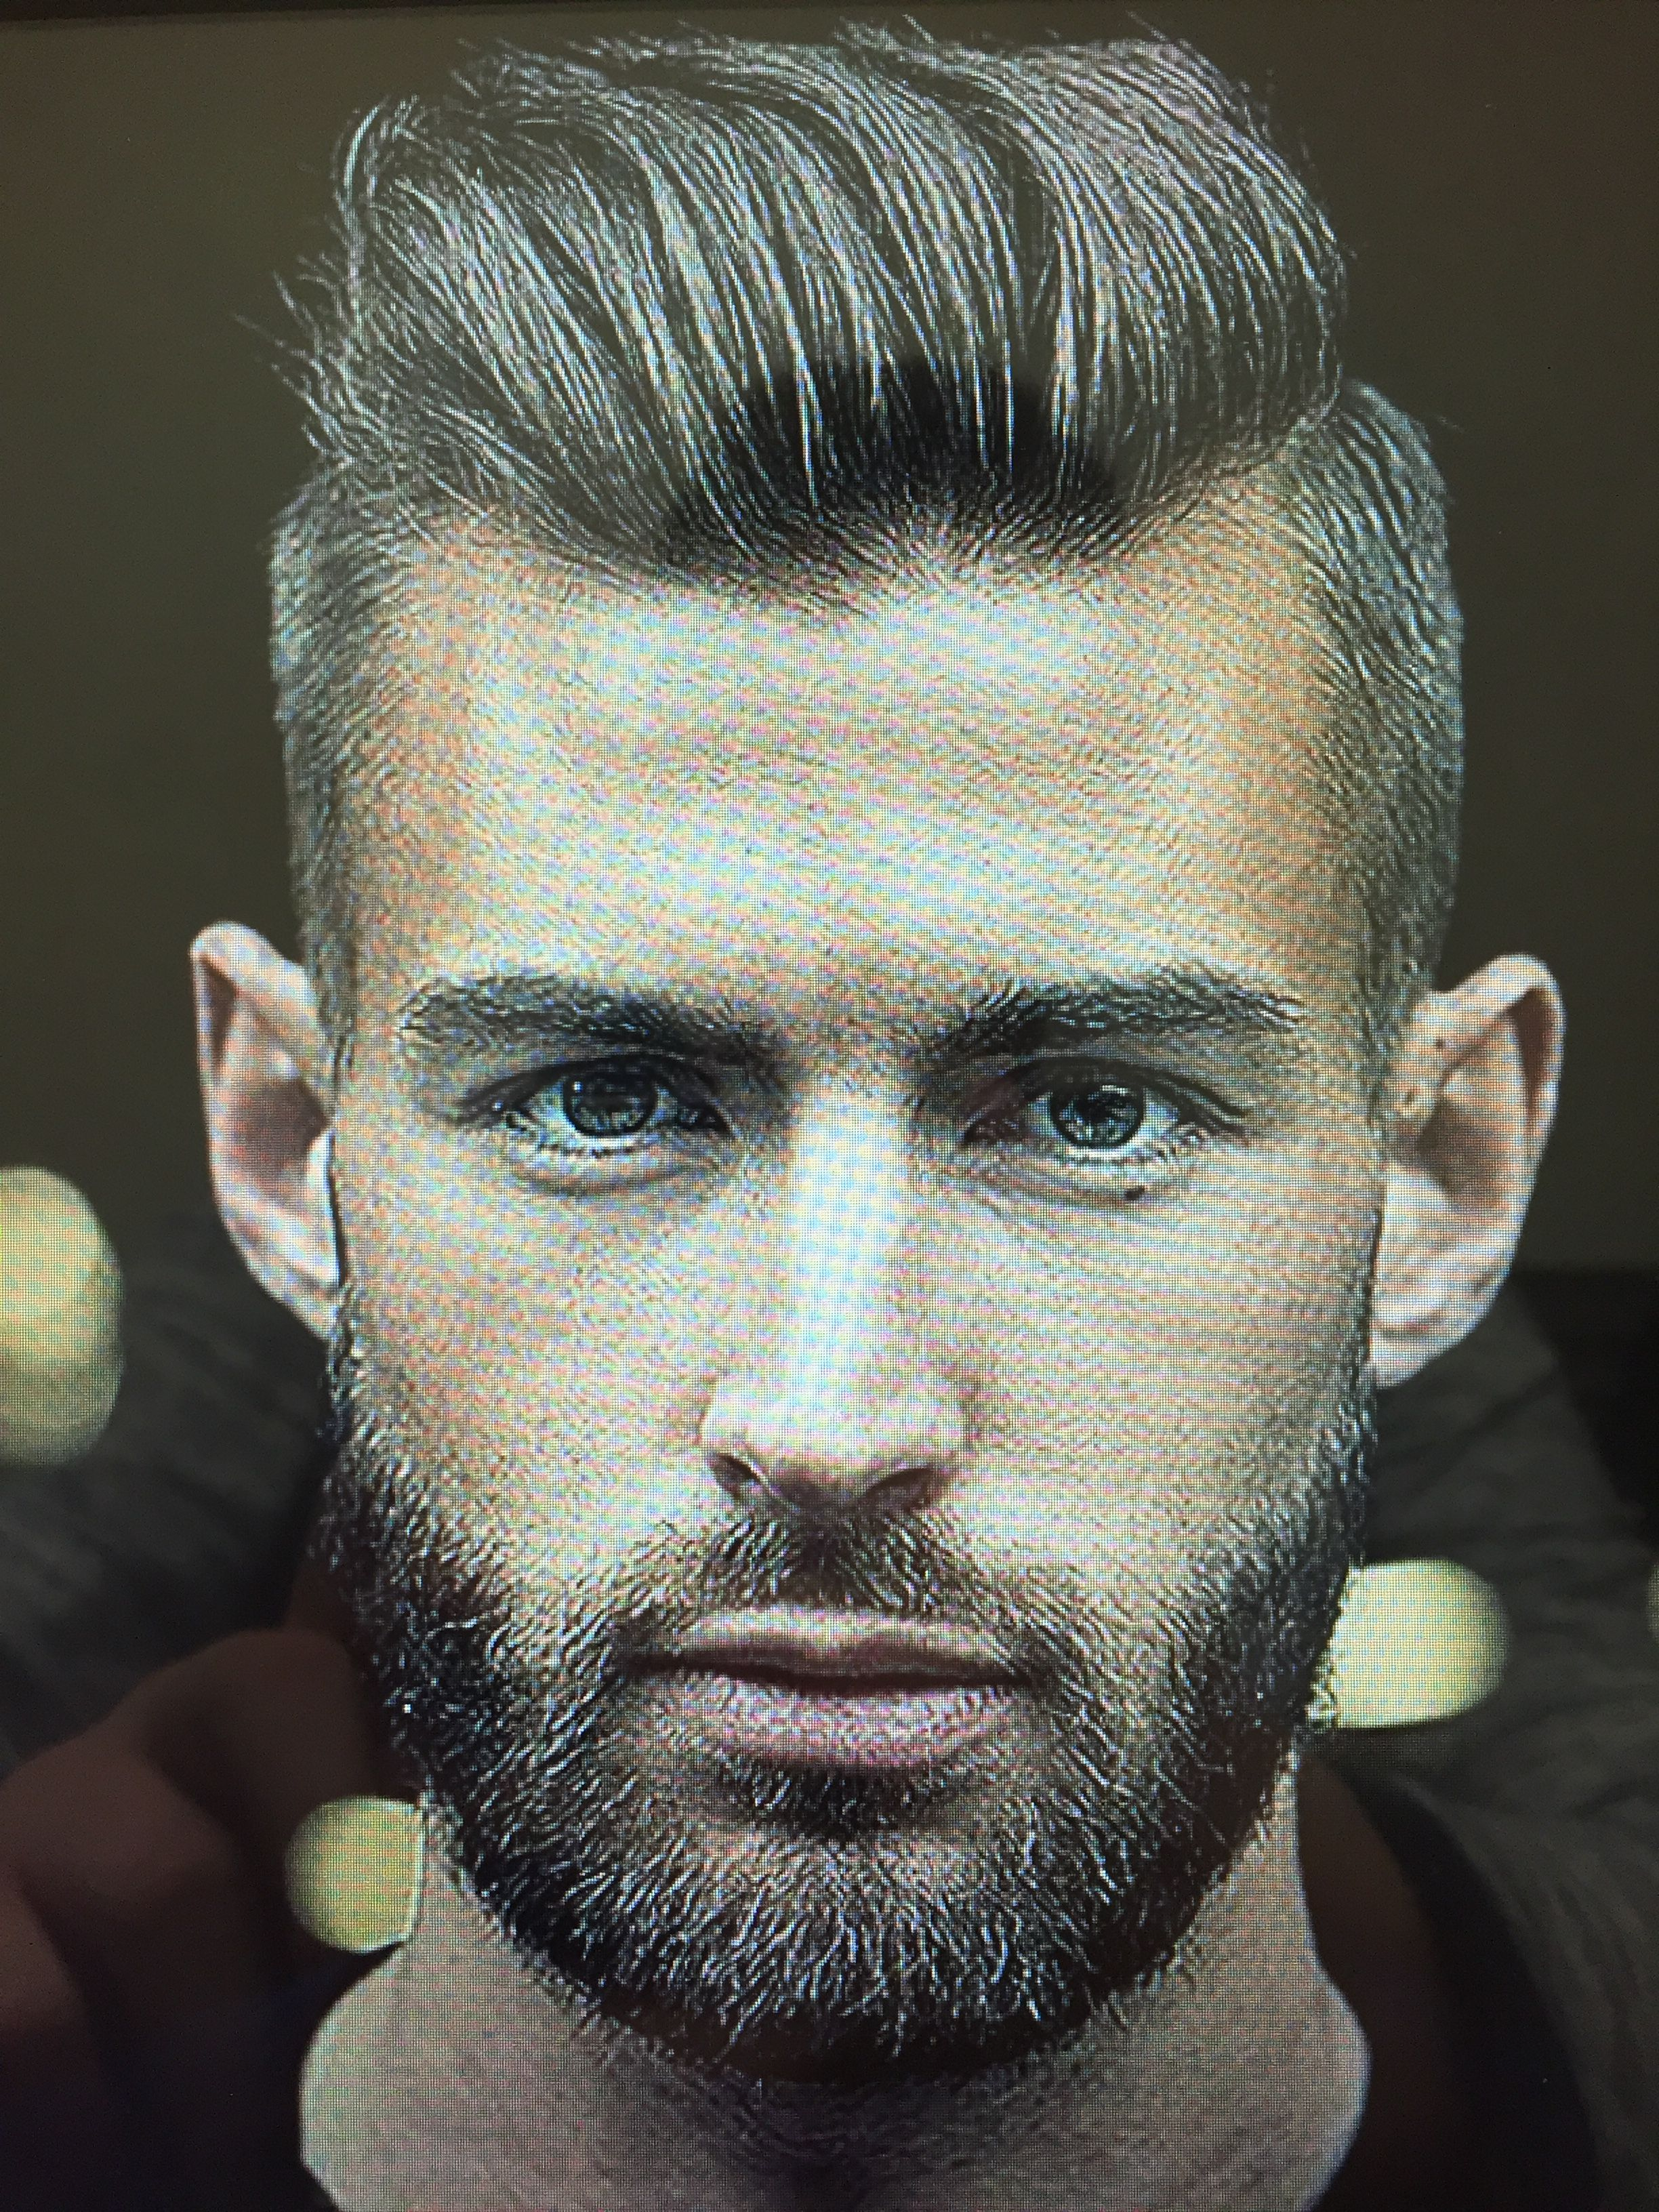 hairstyles hair styles